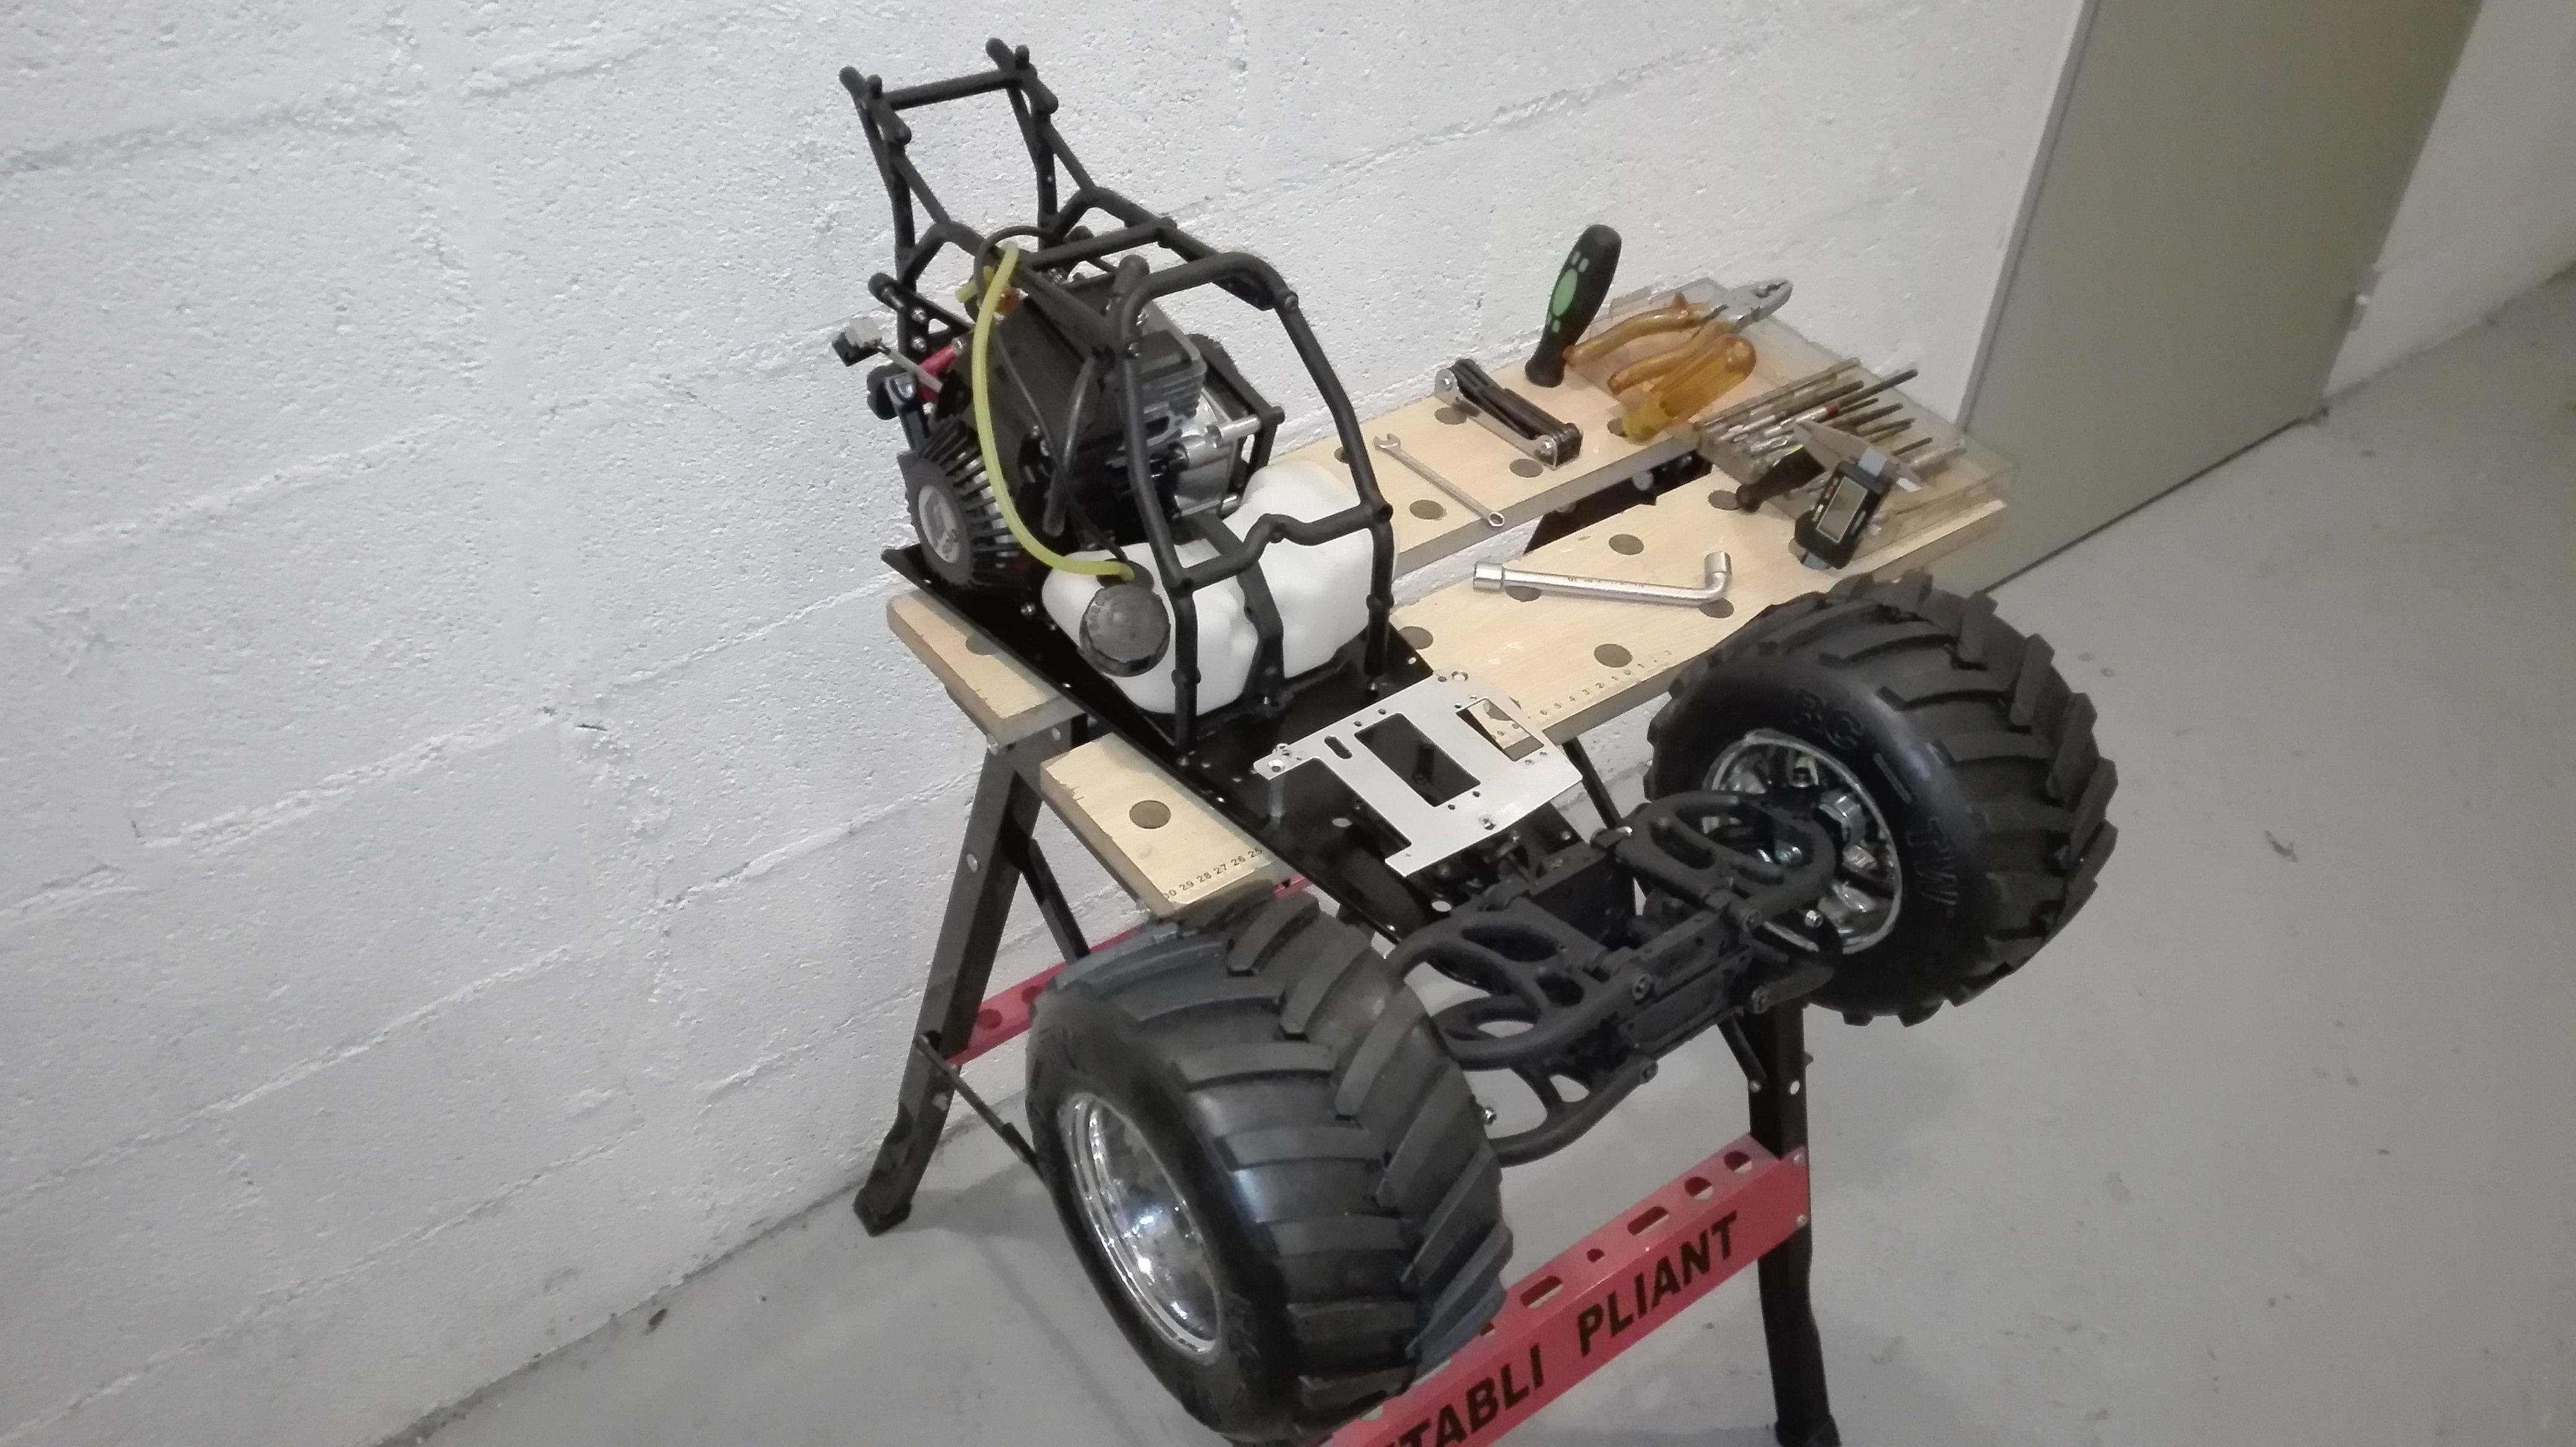 re-montage complet monster truck FG depuis un chassis nu - Page 2 180130104728375544